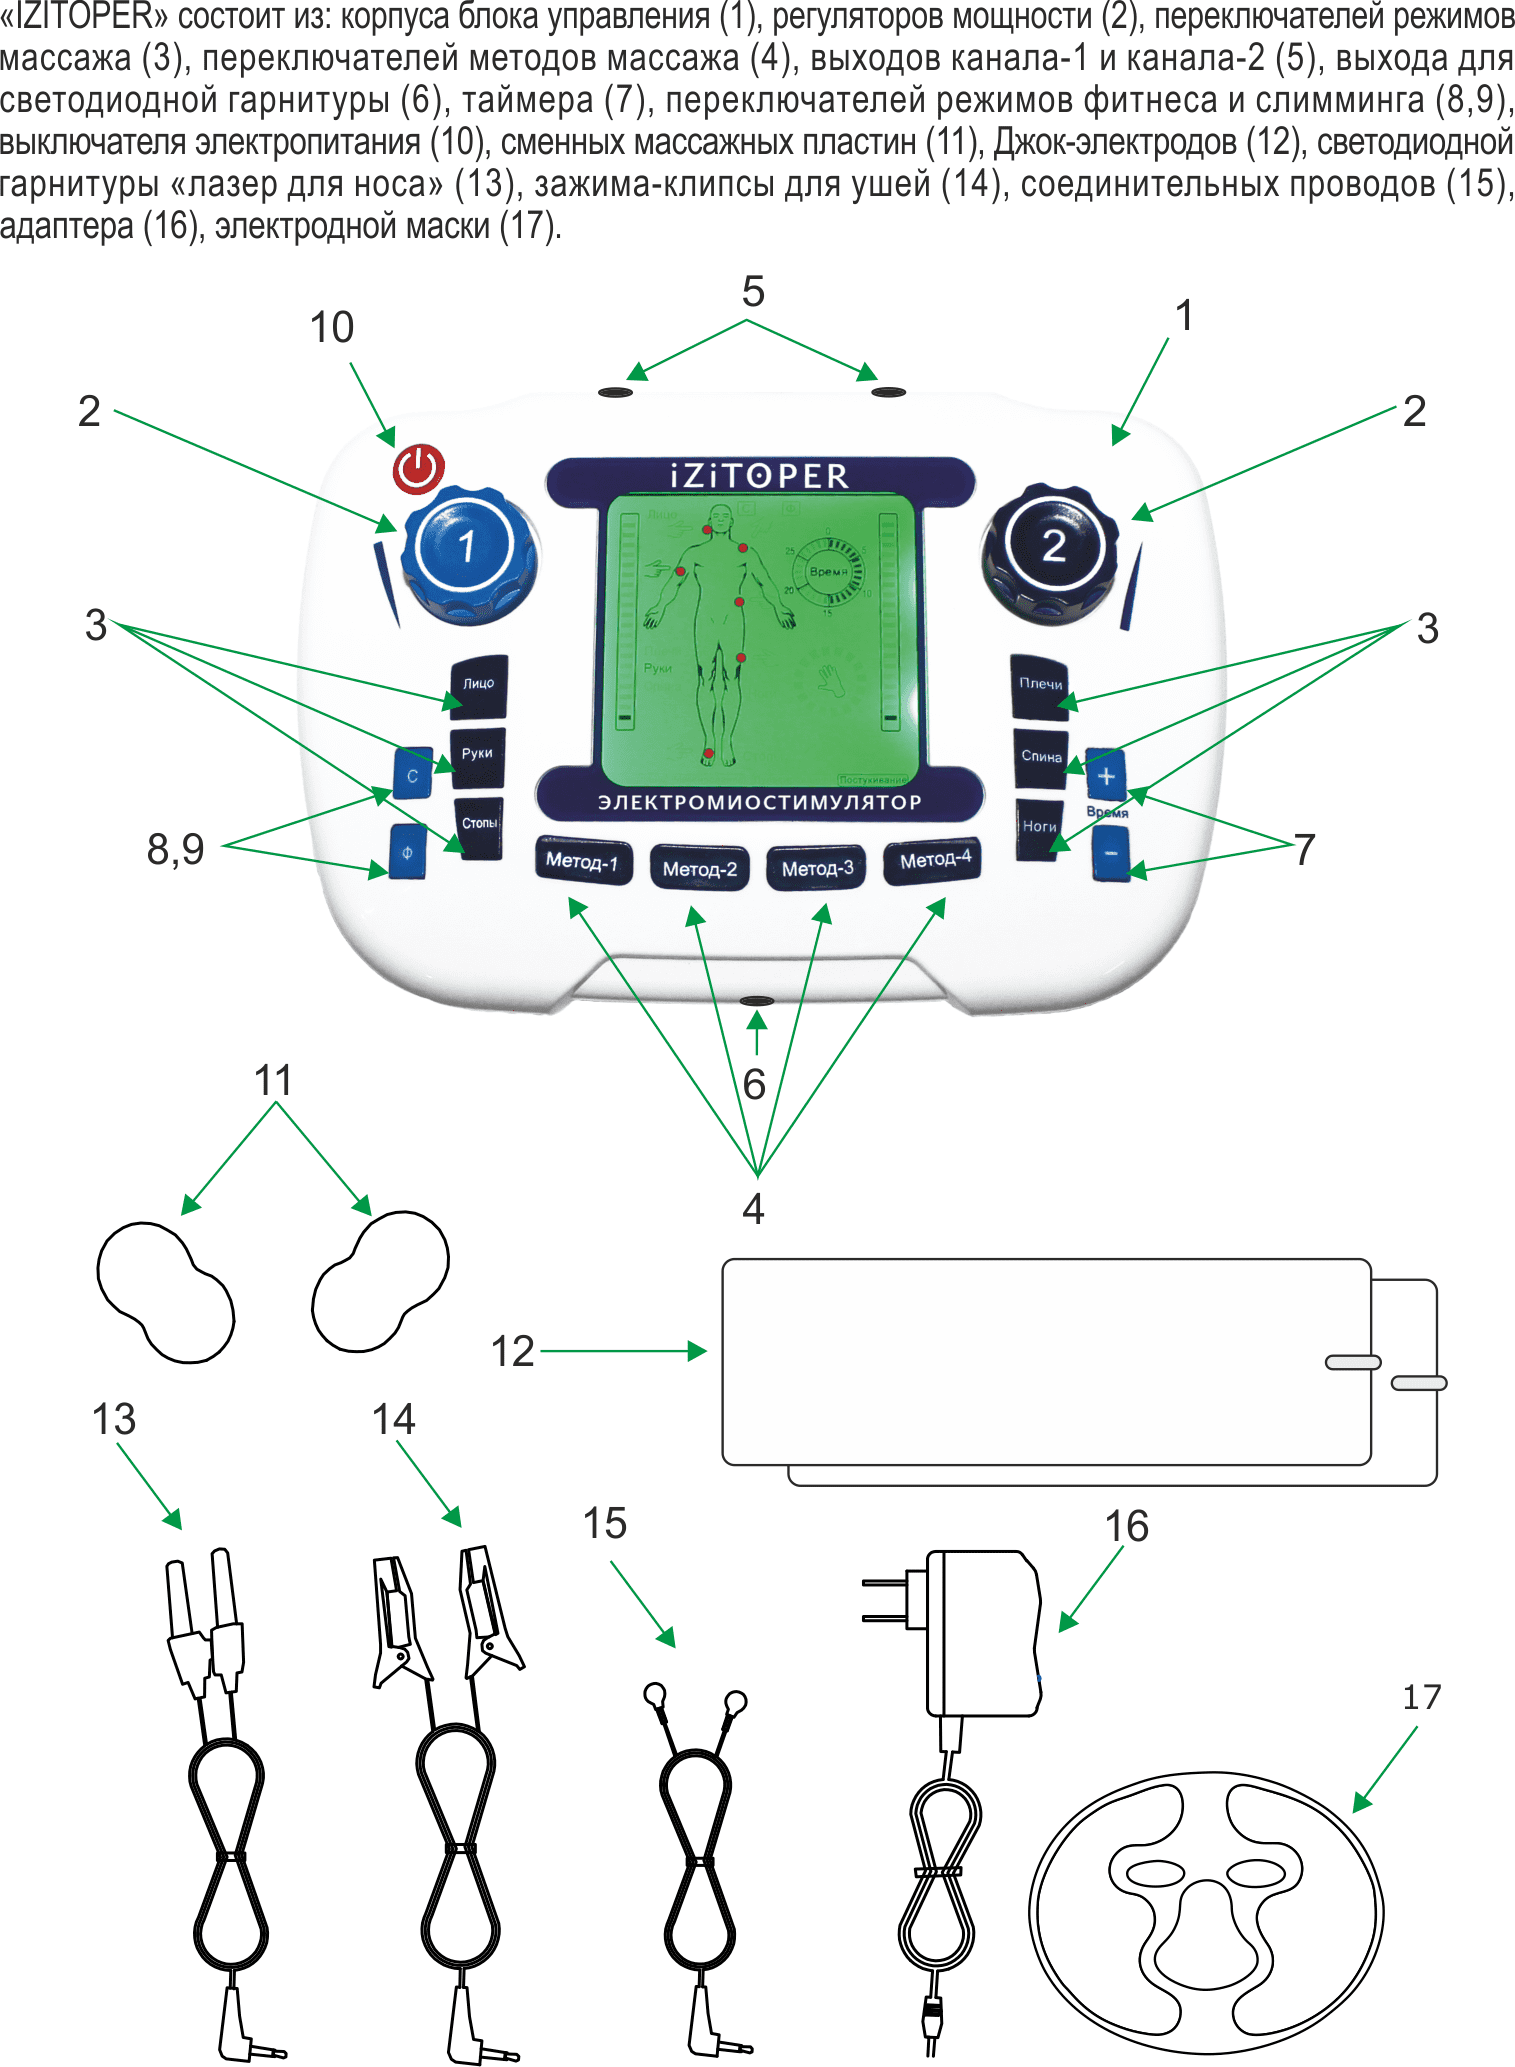 Электромиостимулятор izitoper модель as-305 c